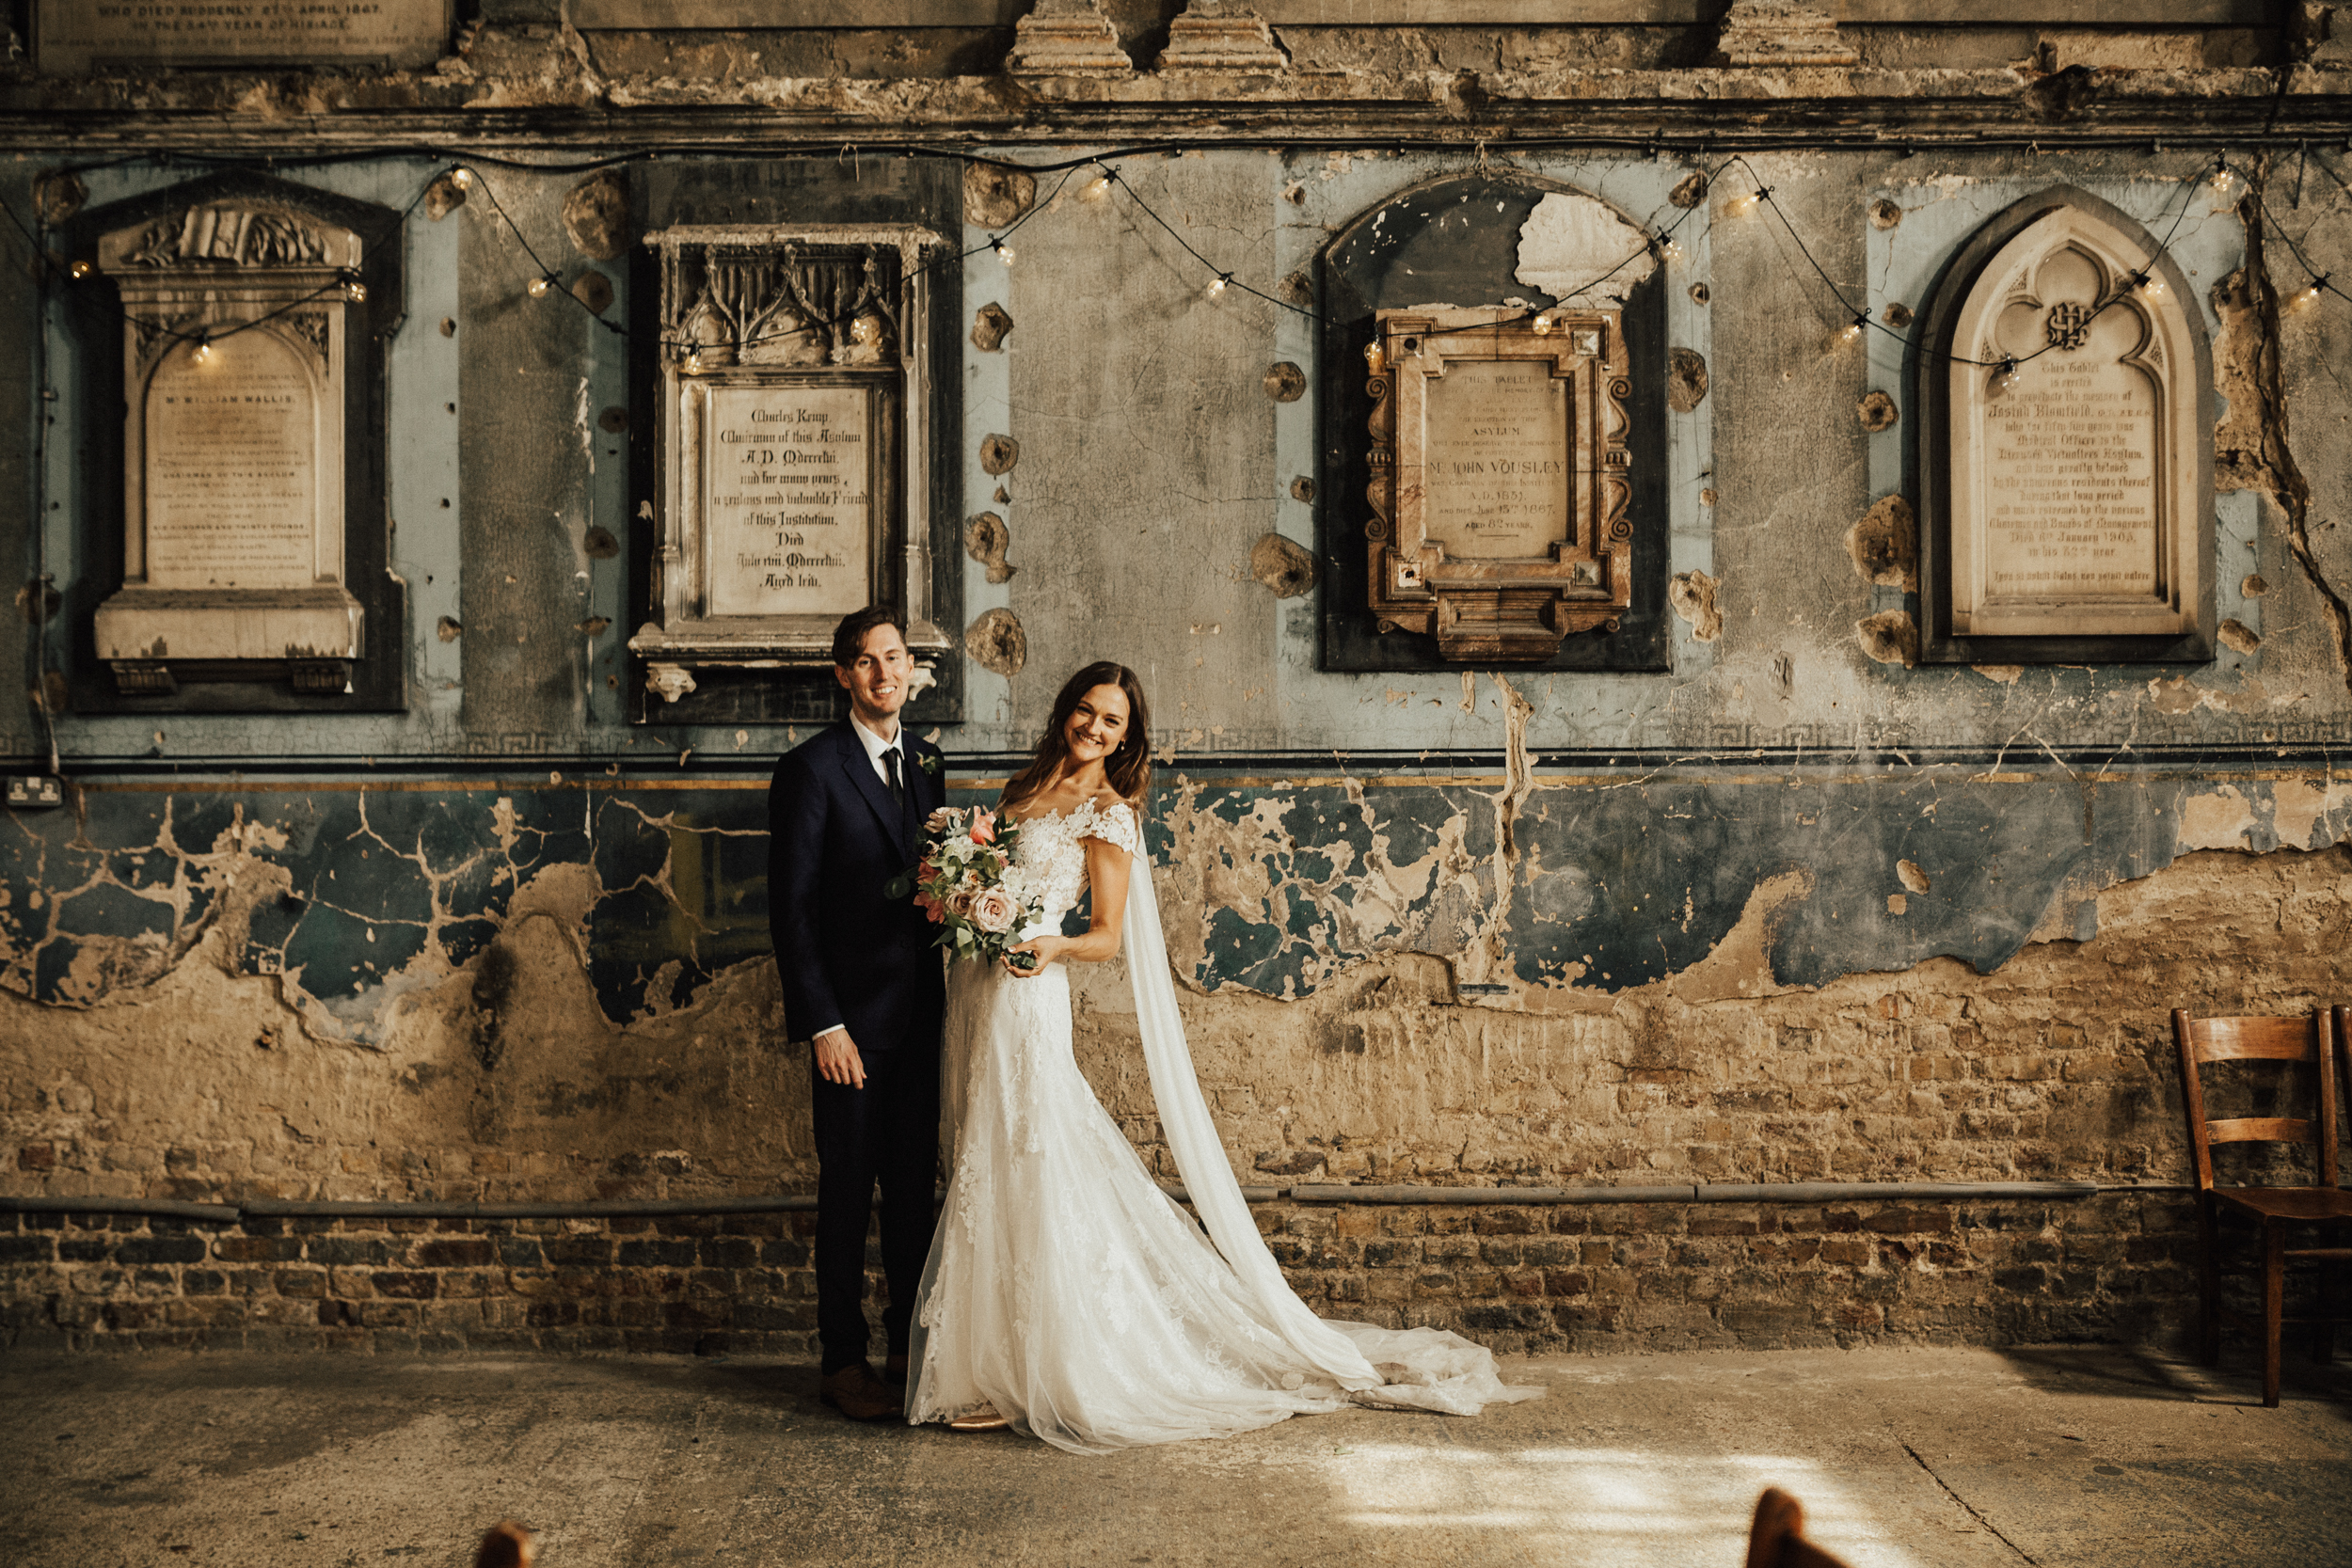 Laura-Benn-The-Asylum-London-The-Ace-Hotel-Wedding-Alternative-Darina-Stoda-Photography-326.jpg